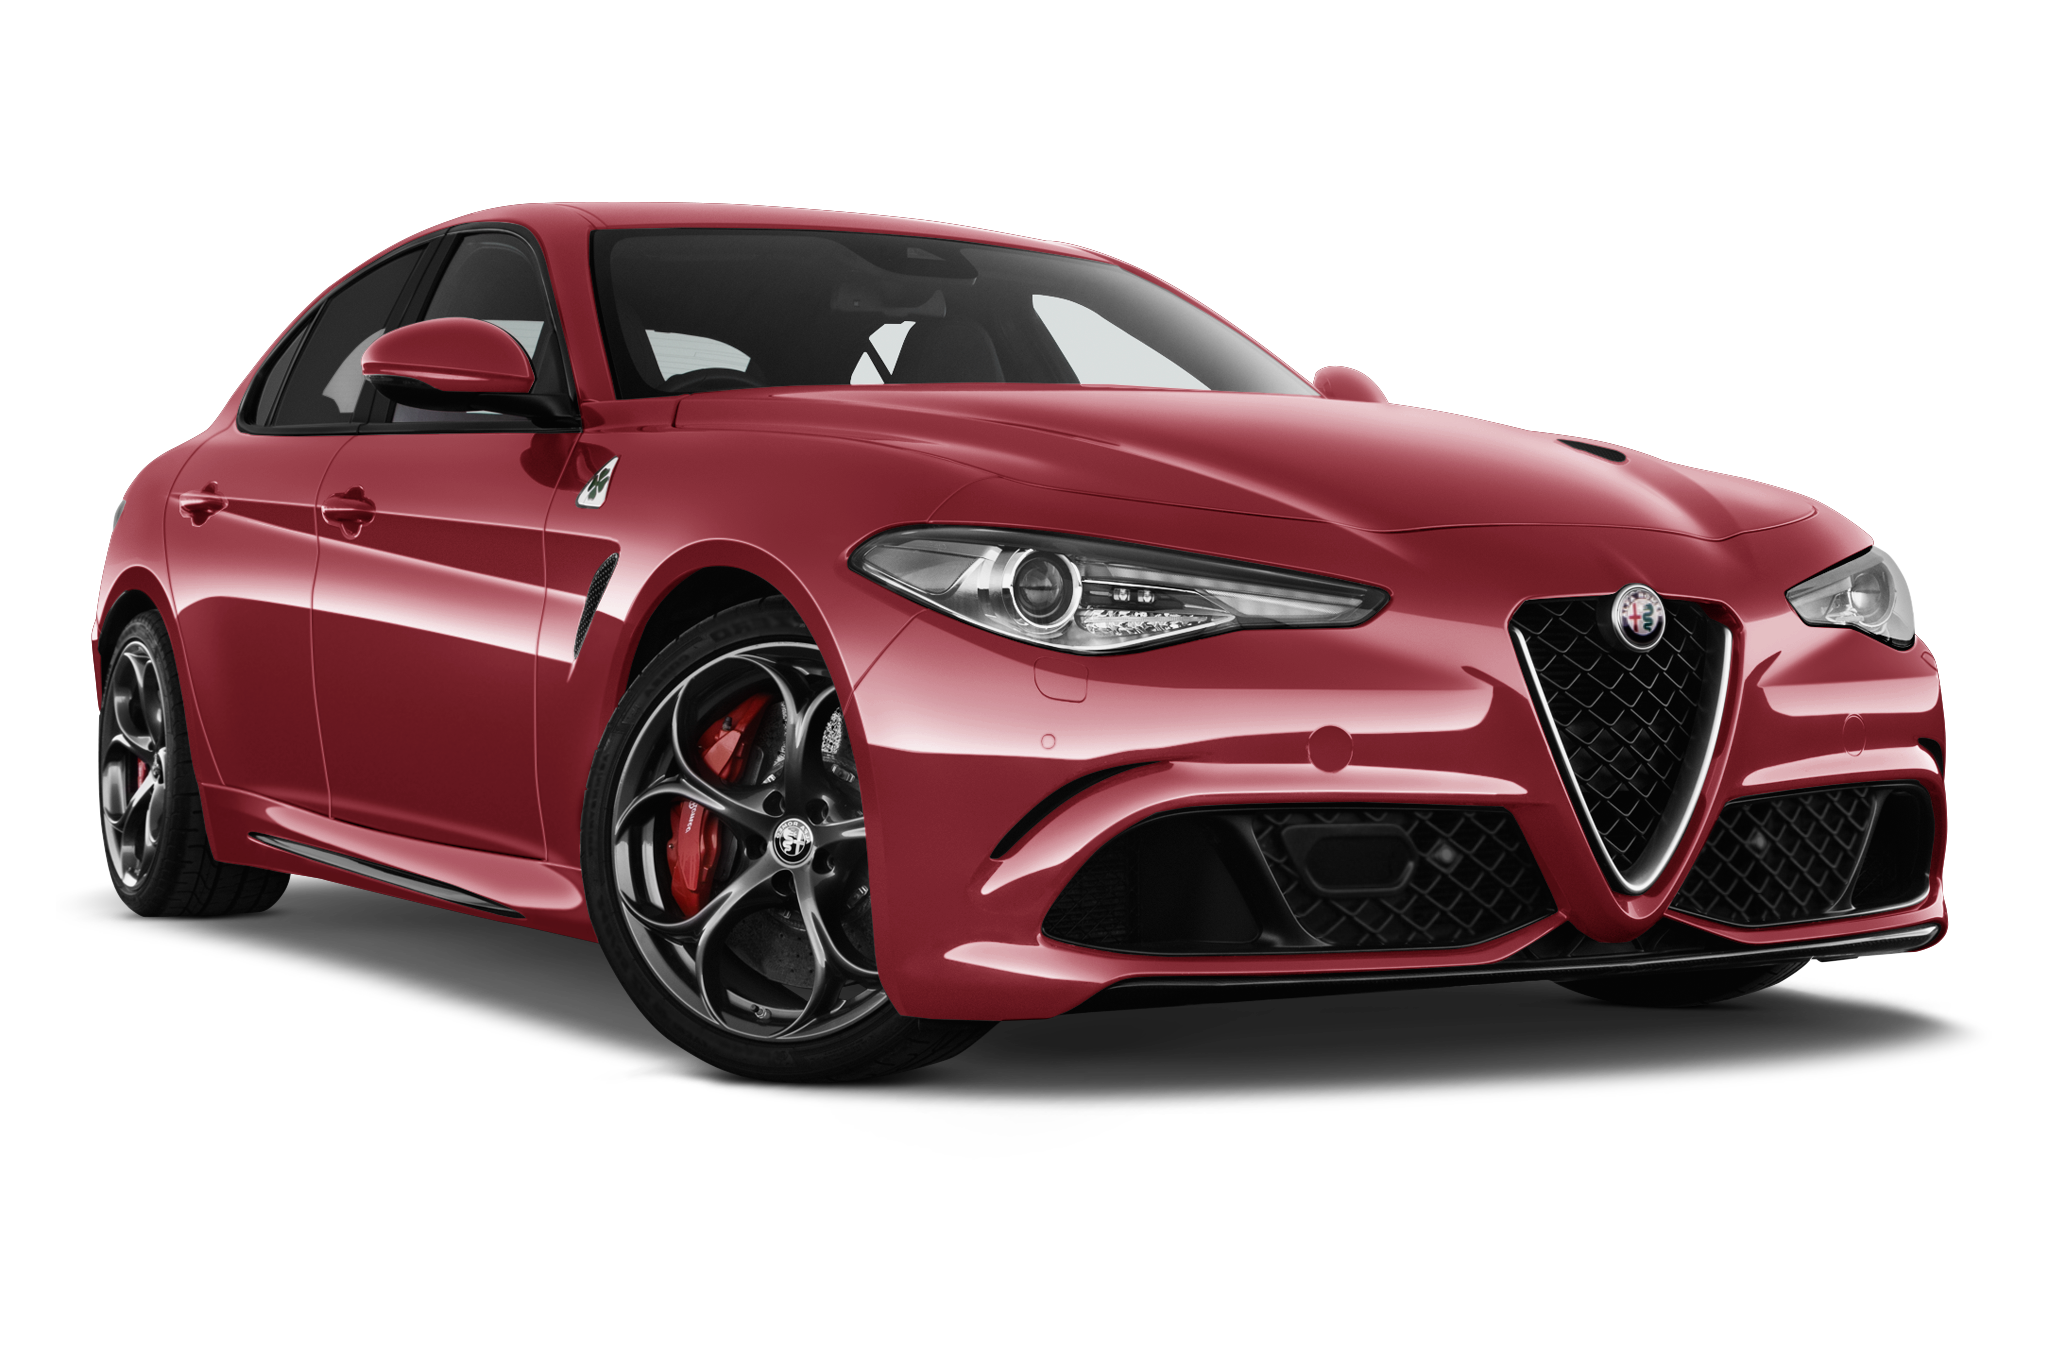 Alfa Romeo Giulia Qv Deals Offers Savings Up To 9 799 Carwow